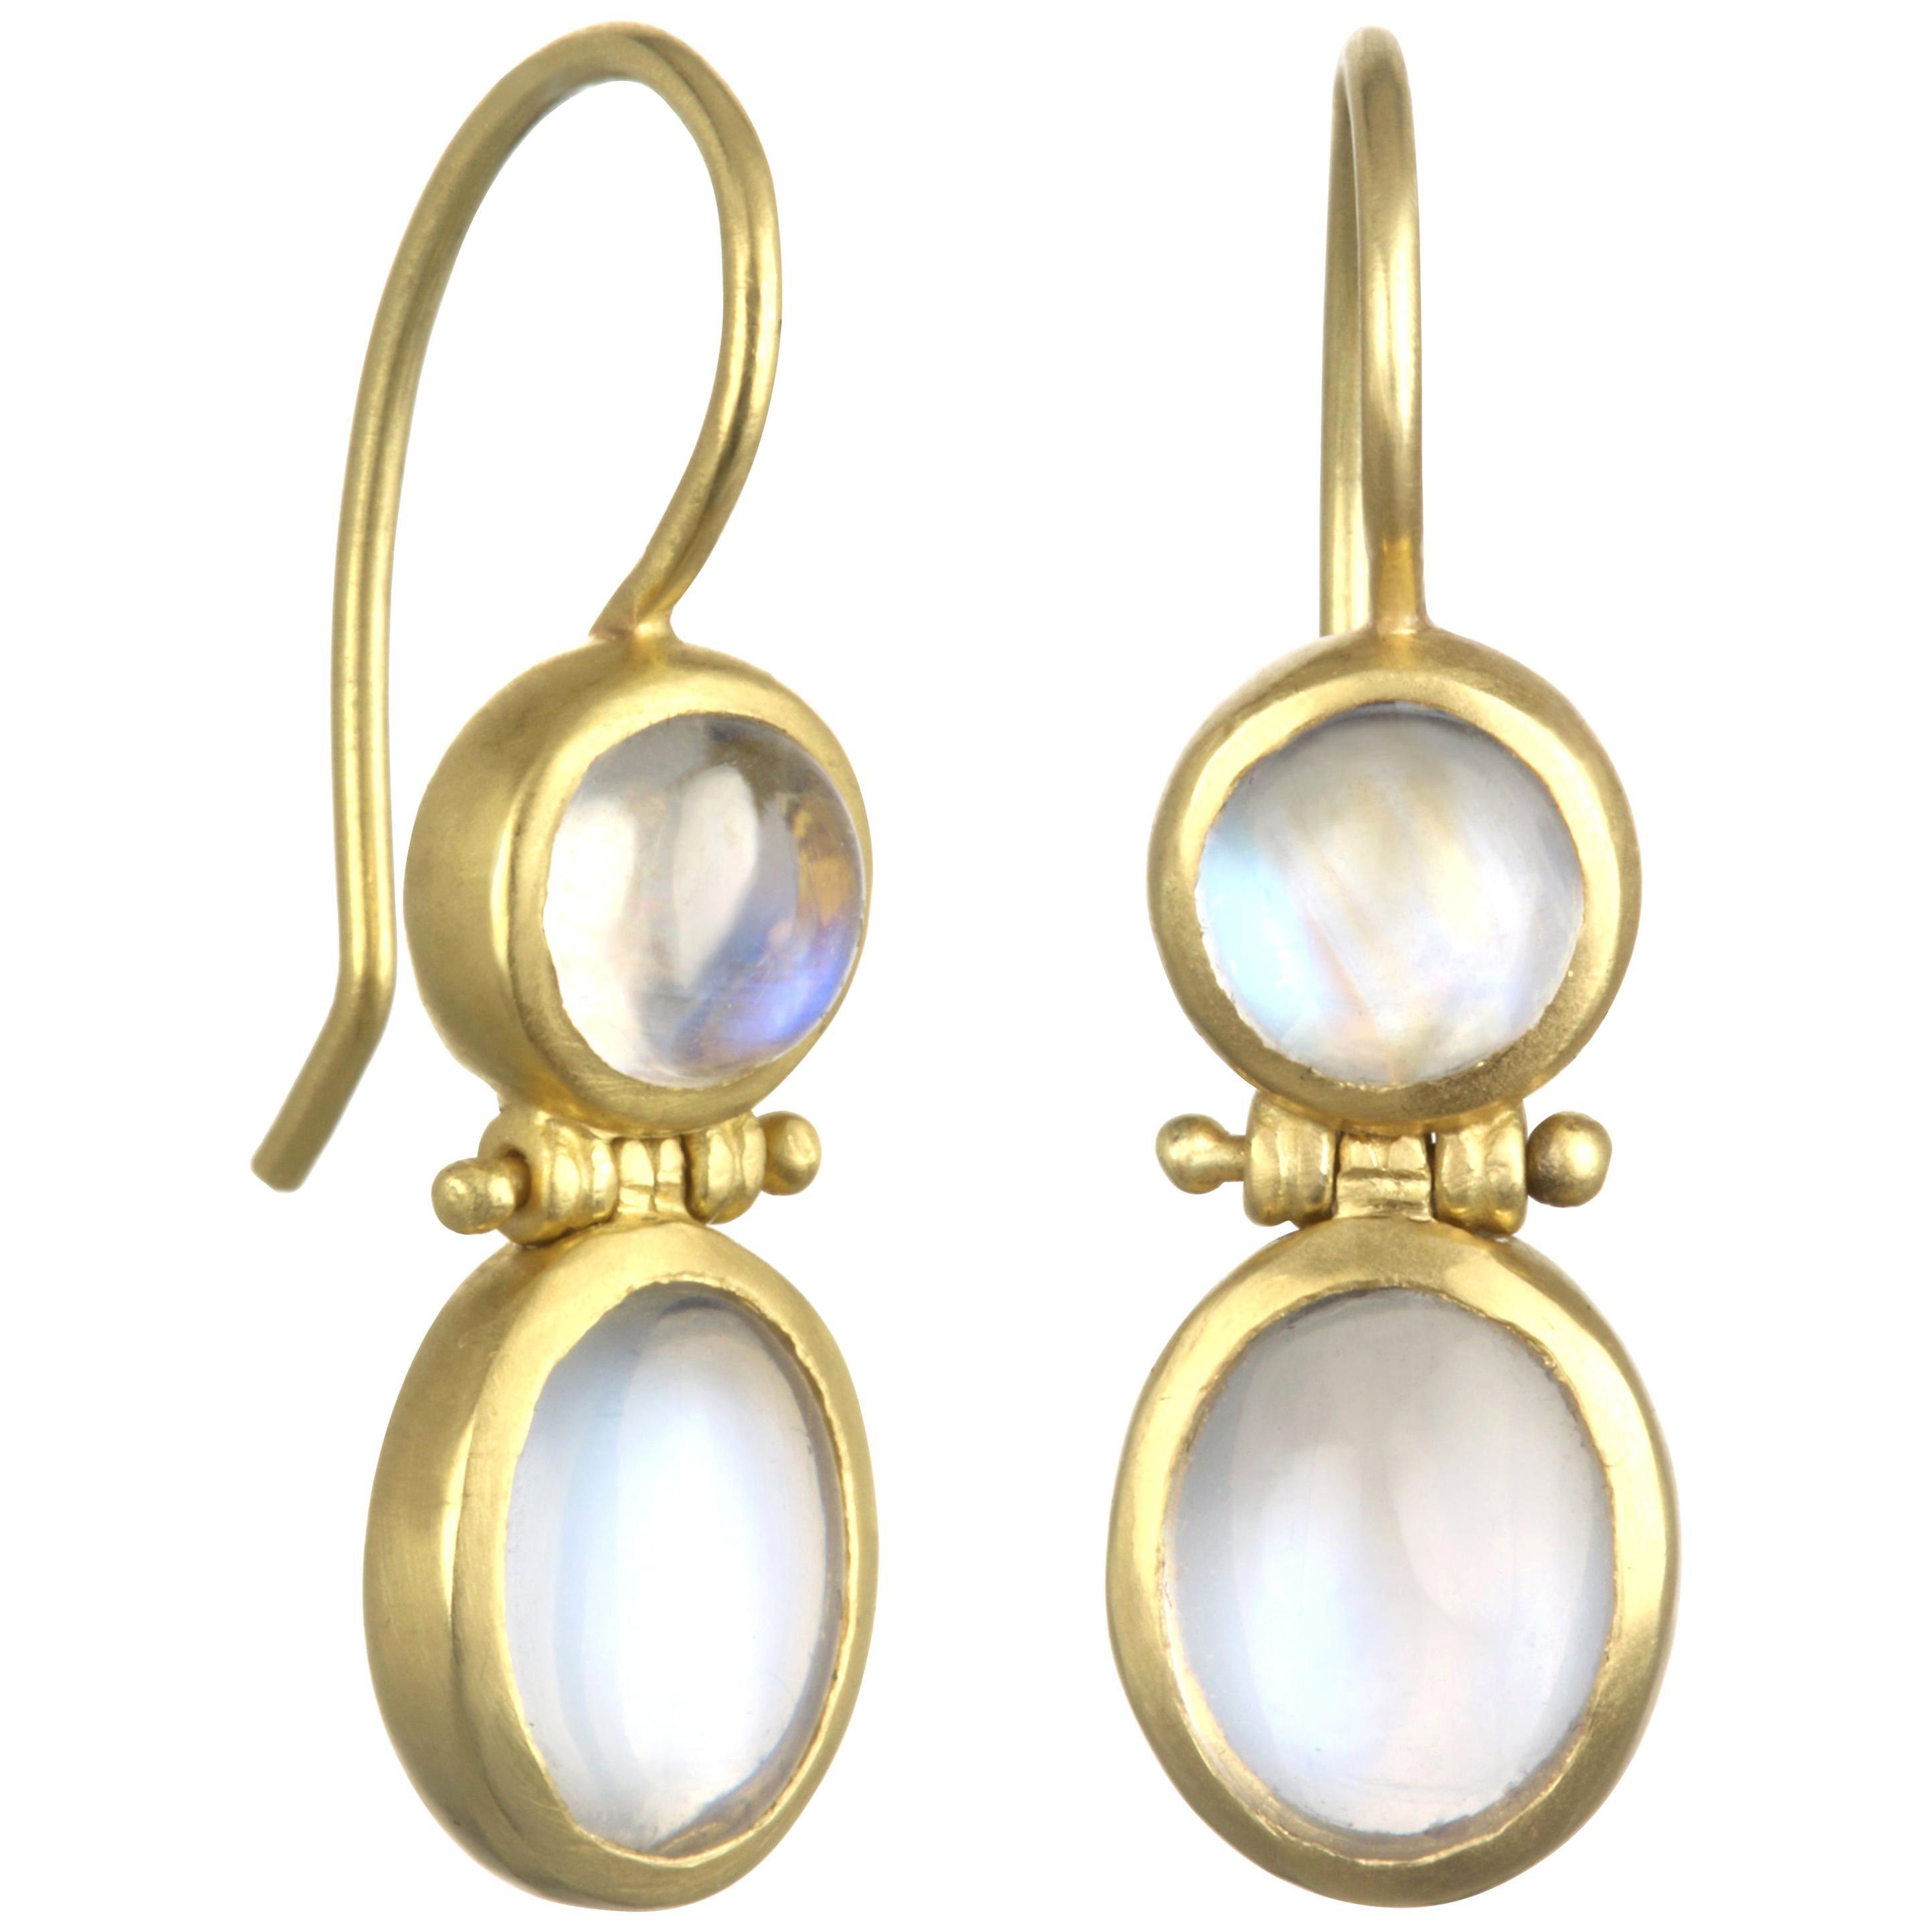 Faye Kim 18 Karat Gold Double Ceylon Moonstone Hinged Earrings